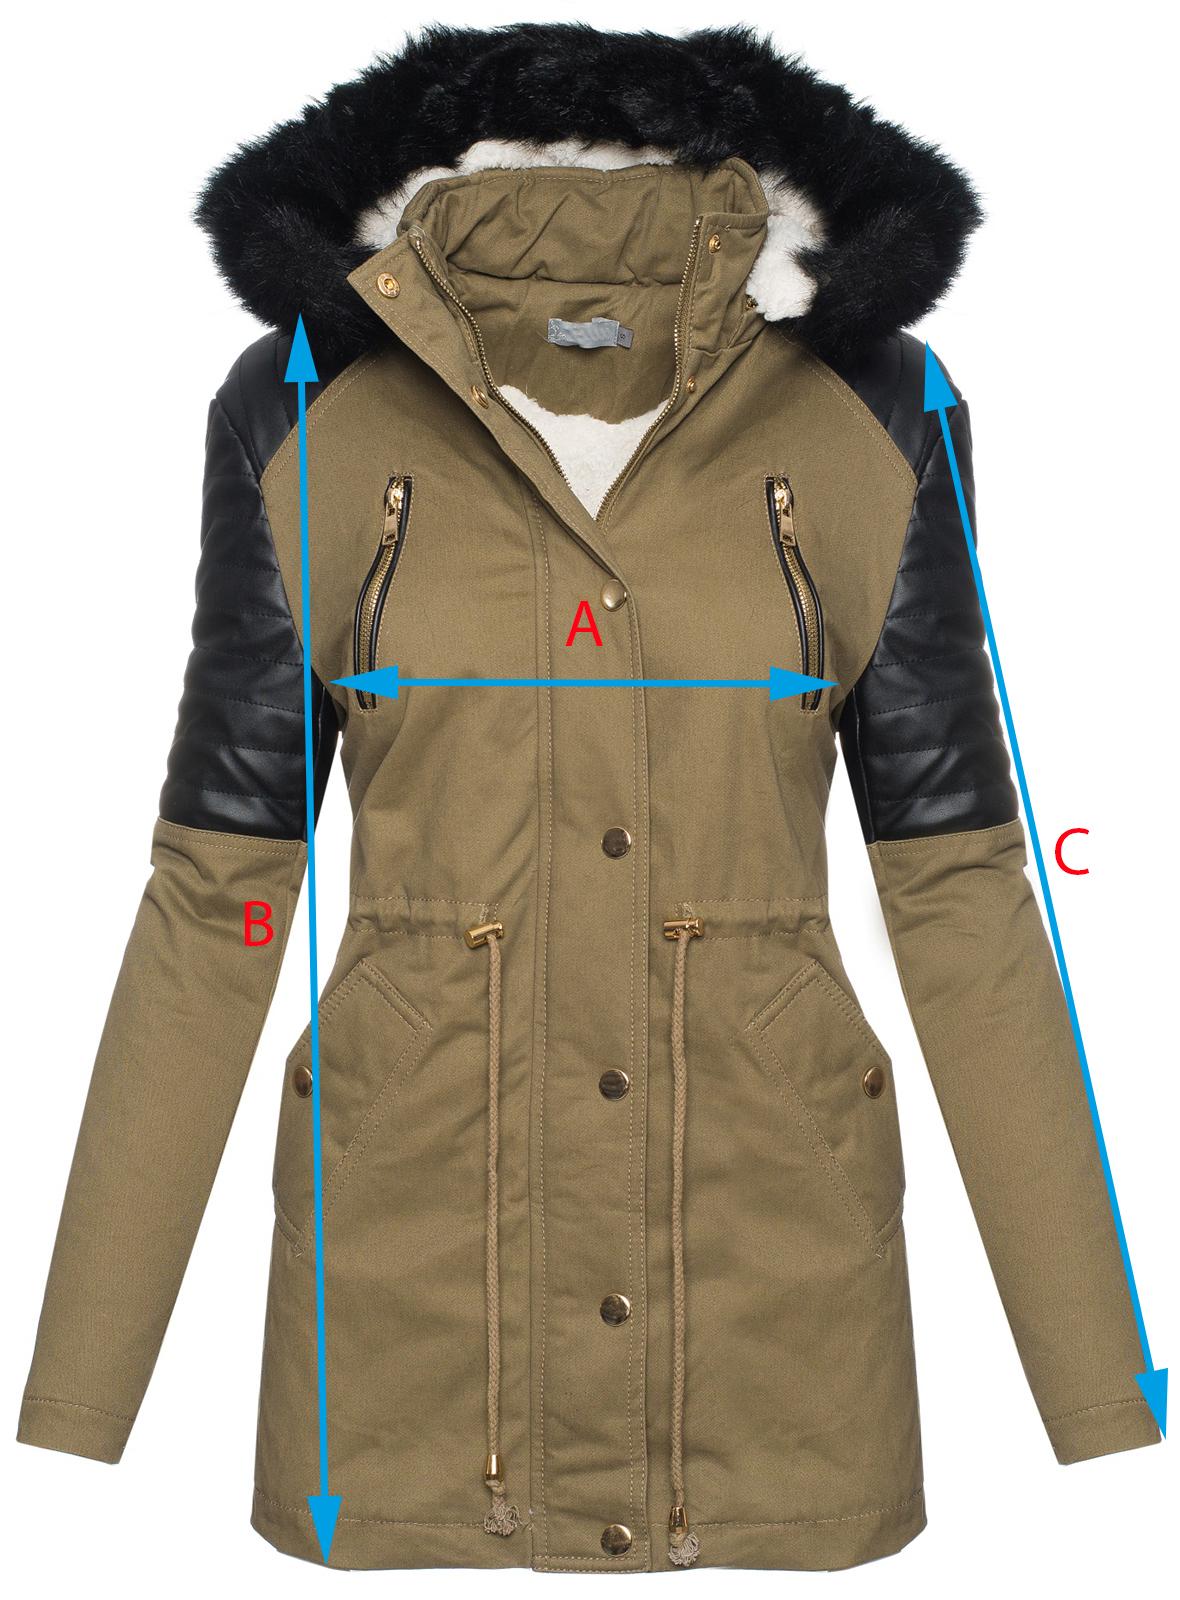 stylische damen winter jacke mantel parka winterjacke lang. Black Bedroom Furniture Sets. Home Design Ideas